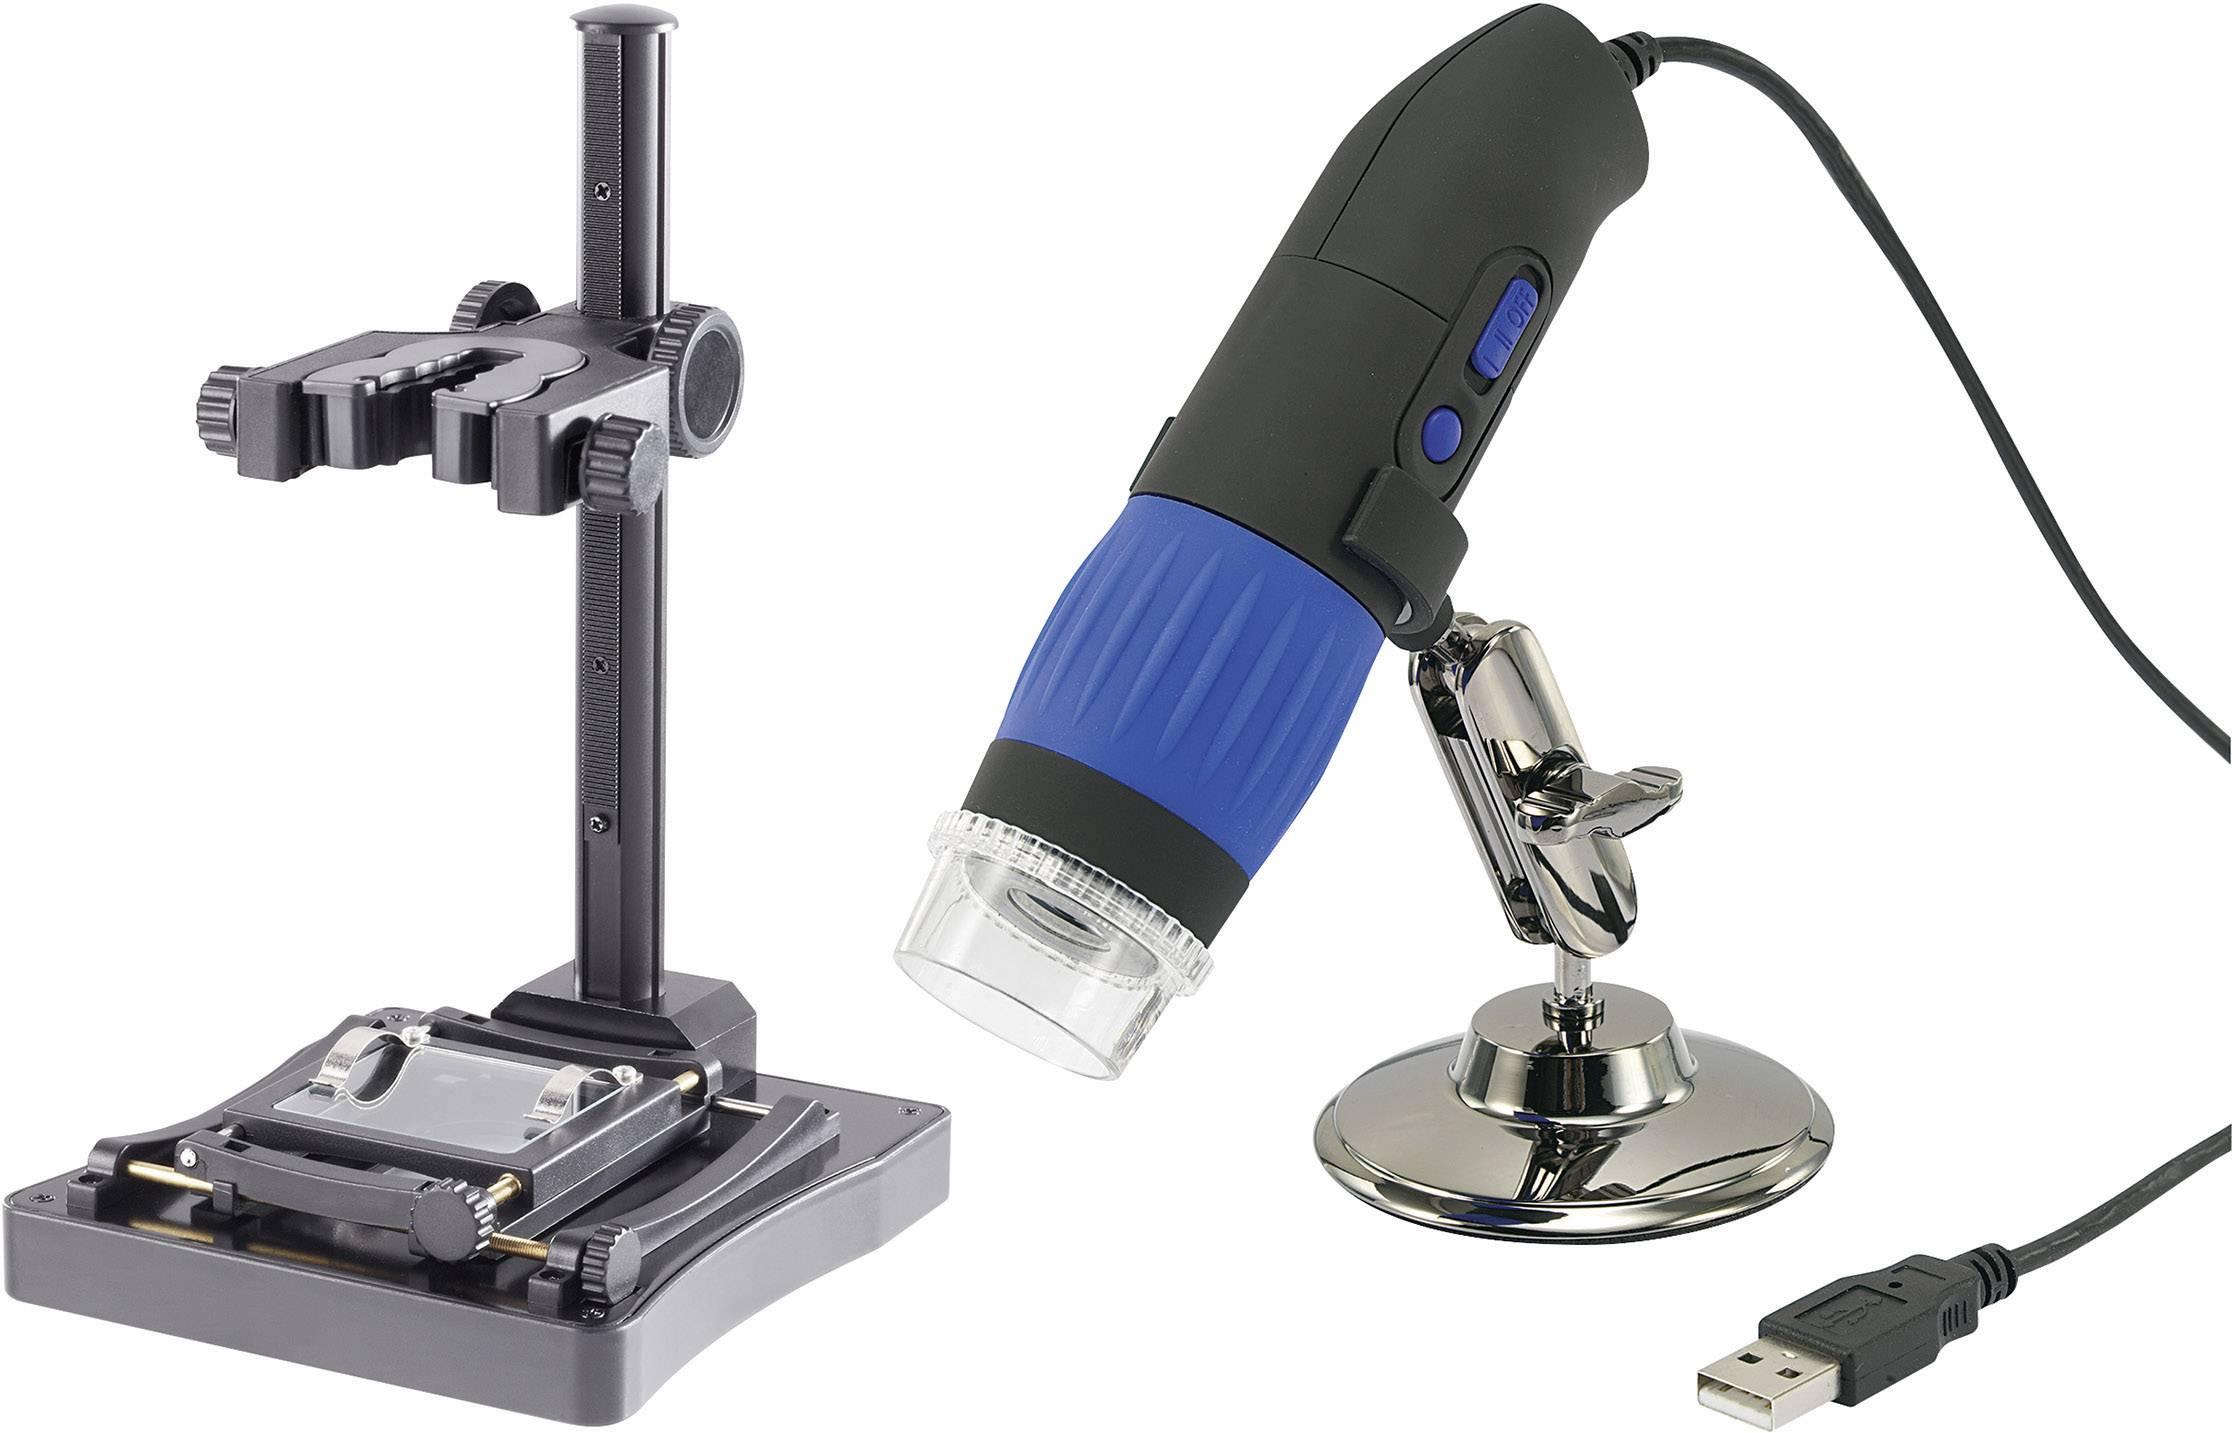 Sada mikroskopovej USB kamery, 9 Mpx, a stojanu, DP-M17